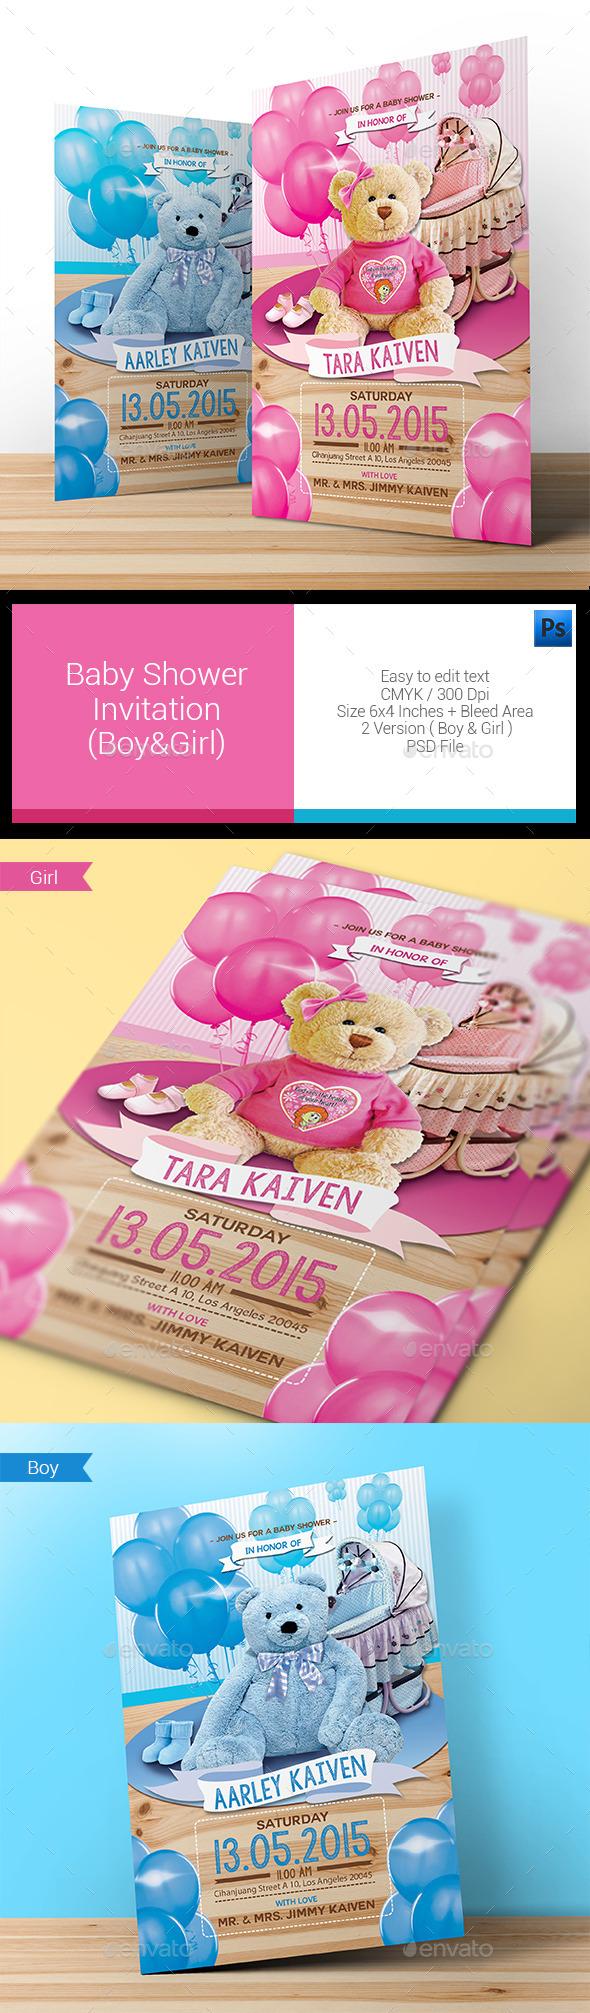 Baby Shower Invitation (Boy & Girl) - Invitations Cards & Invites